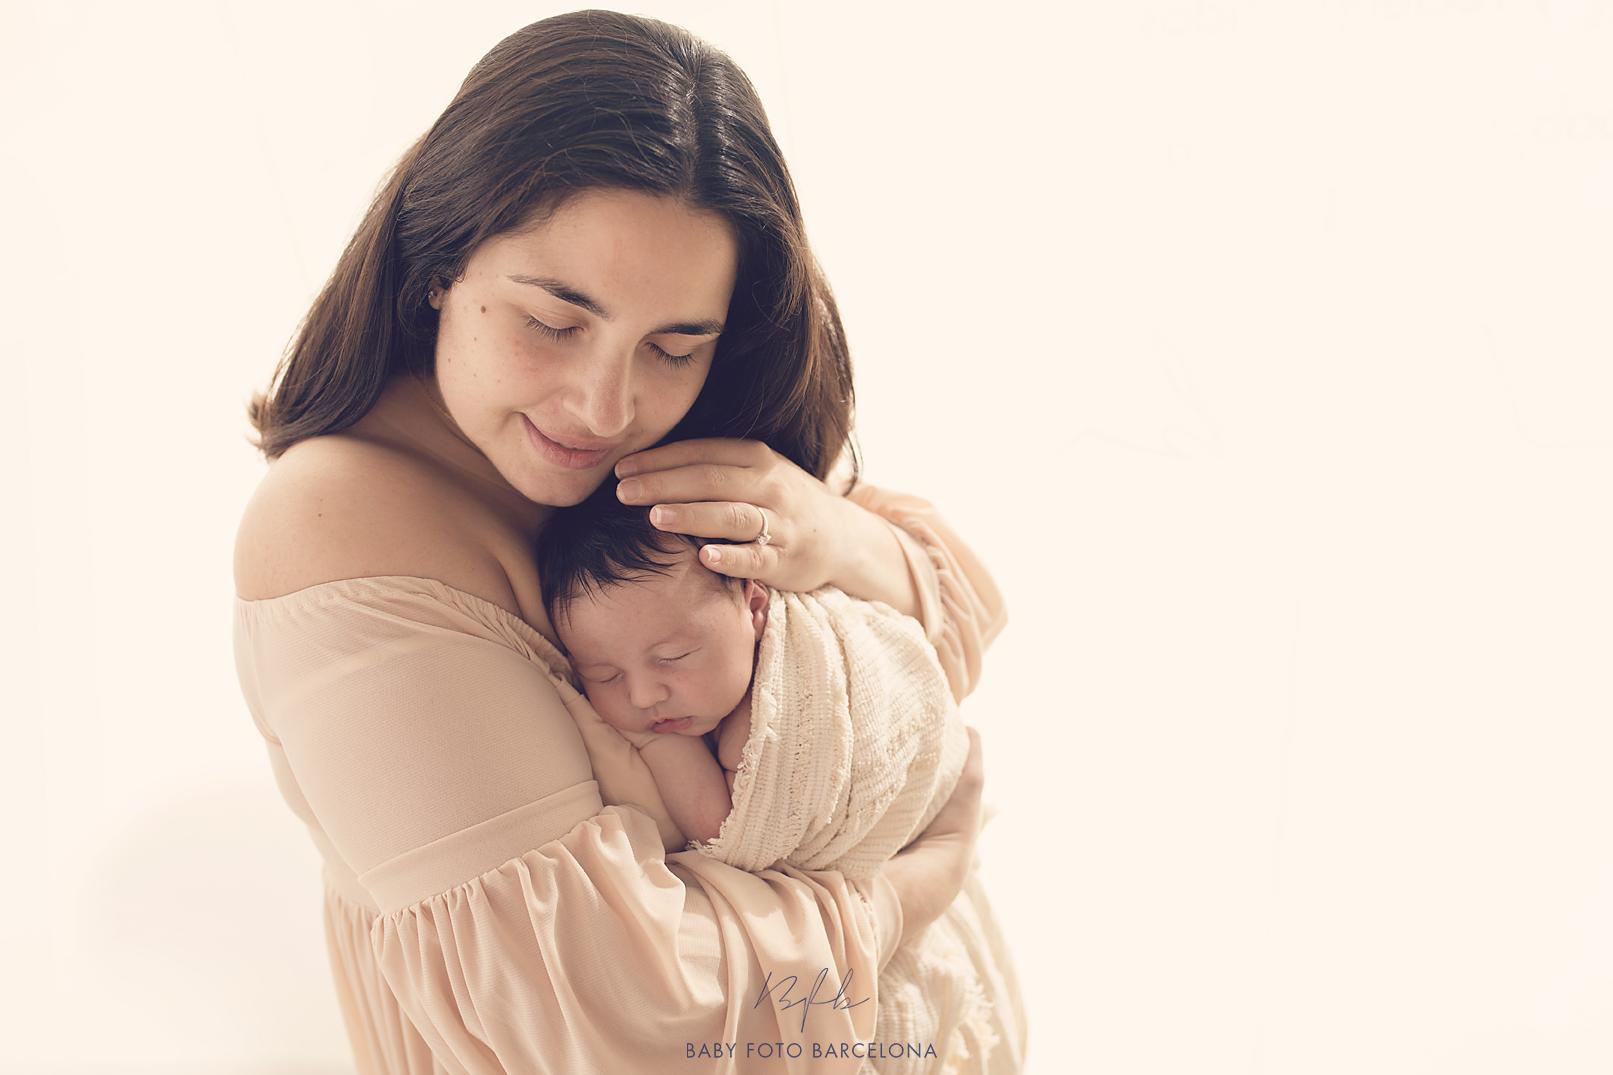 Baby Foto Barcelona - Sesión Newborn (recién nacido) Fotos en familia / Sessió nounats Fotos amb la familia